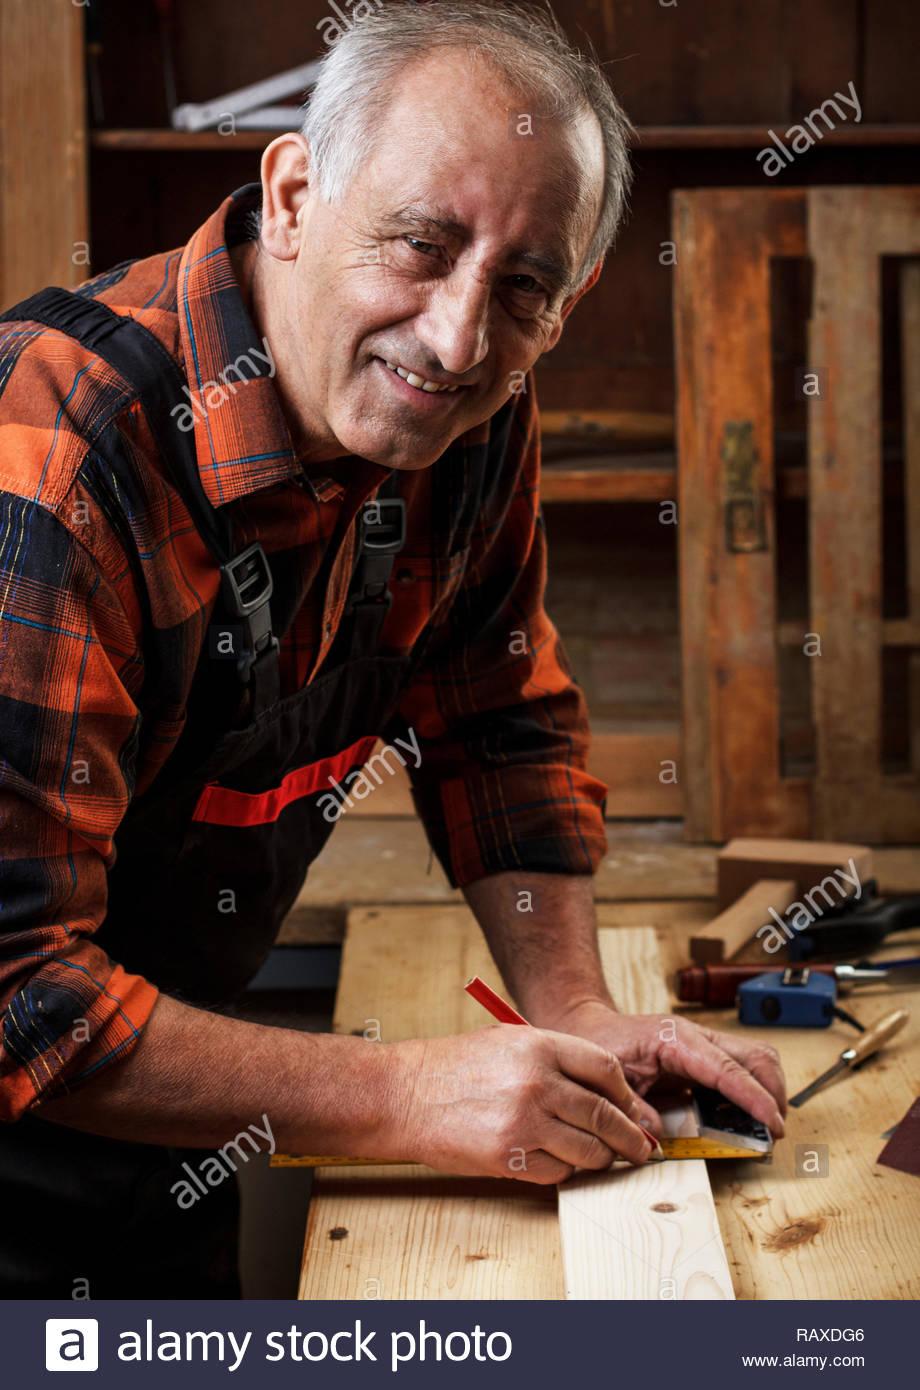 Senior carpenter working in his workshop, restoring the old furniture. - Stock Image